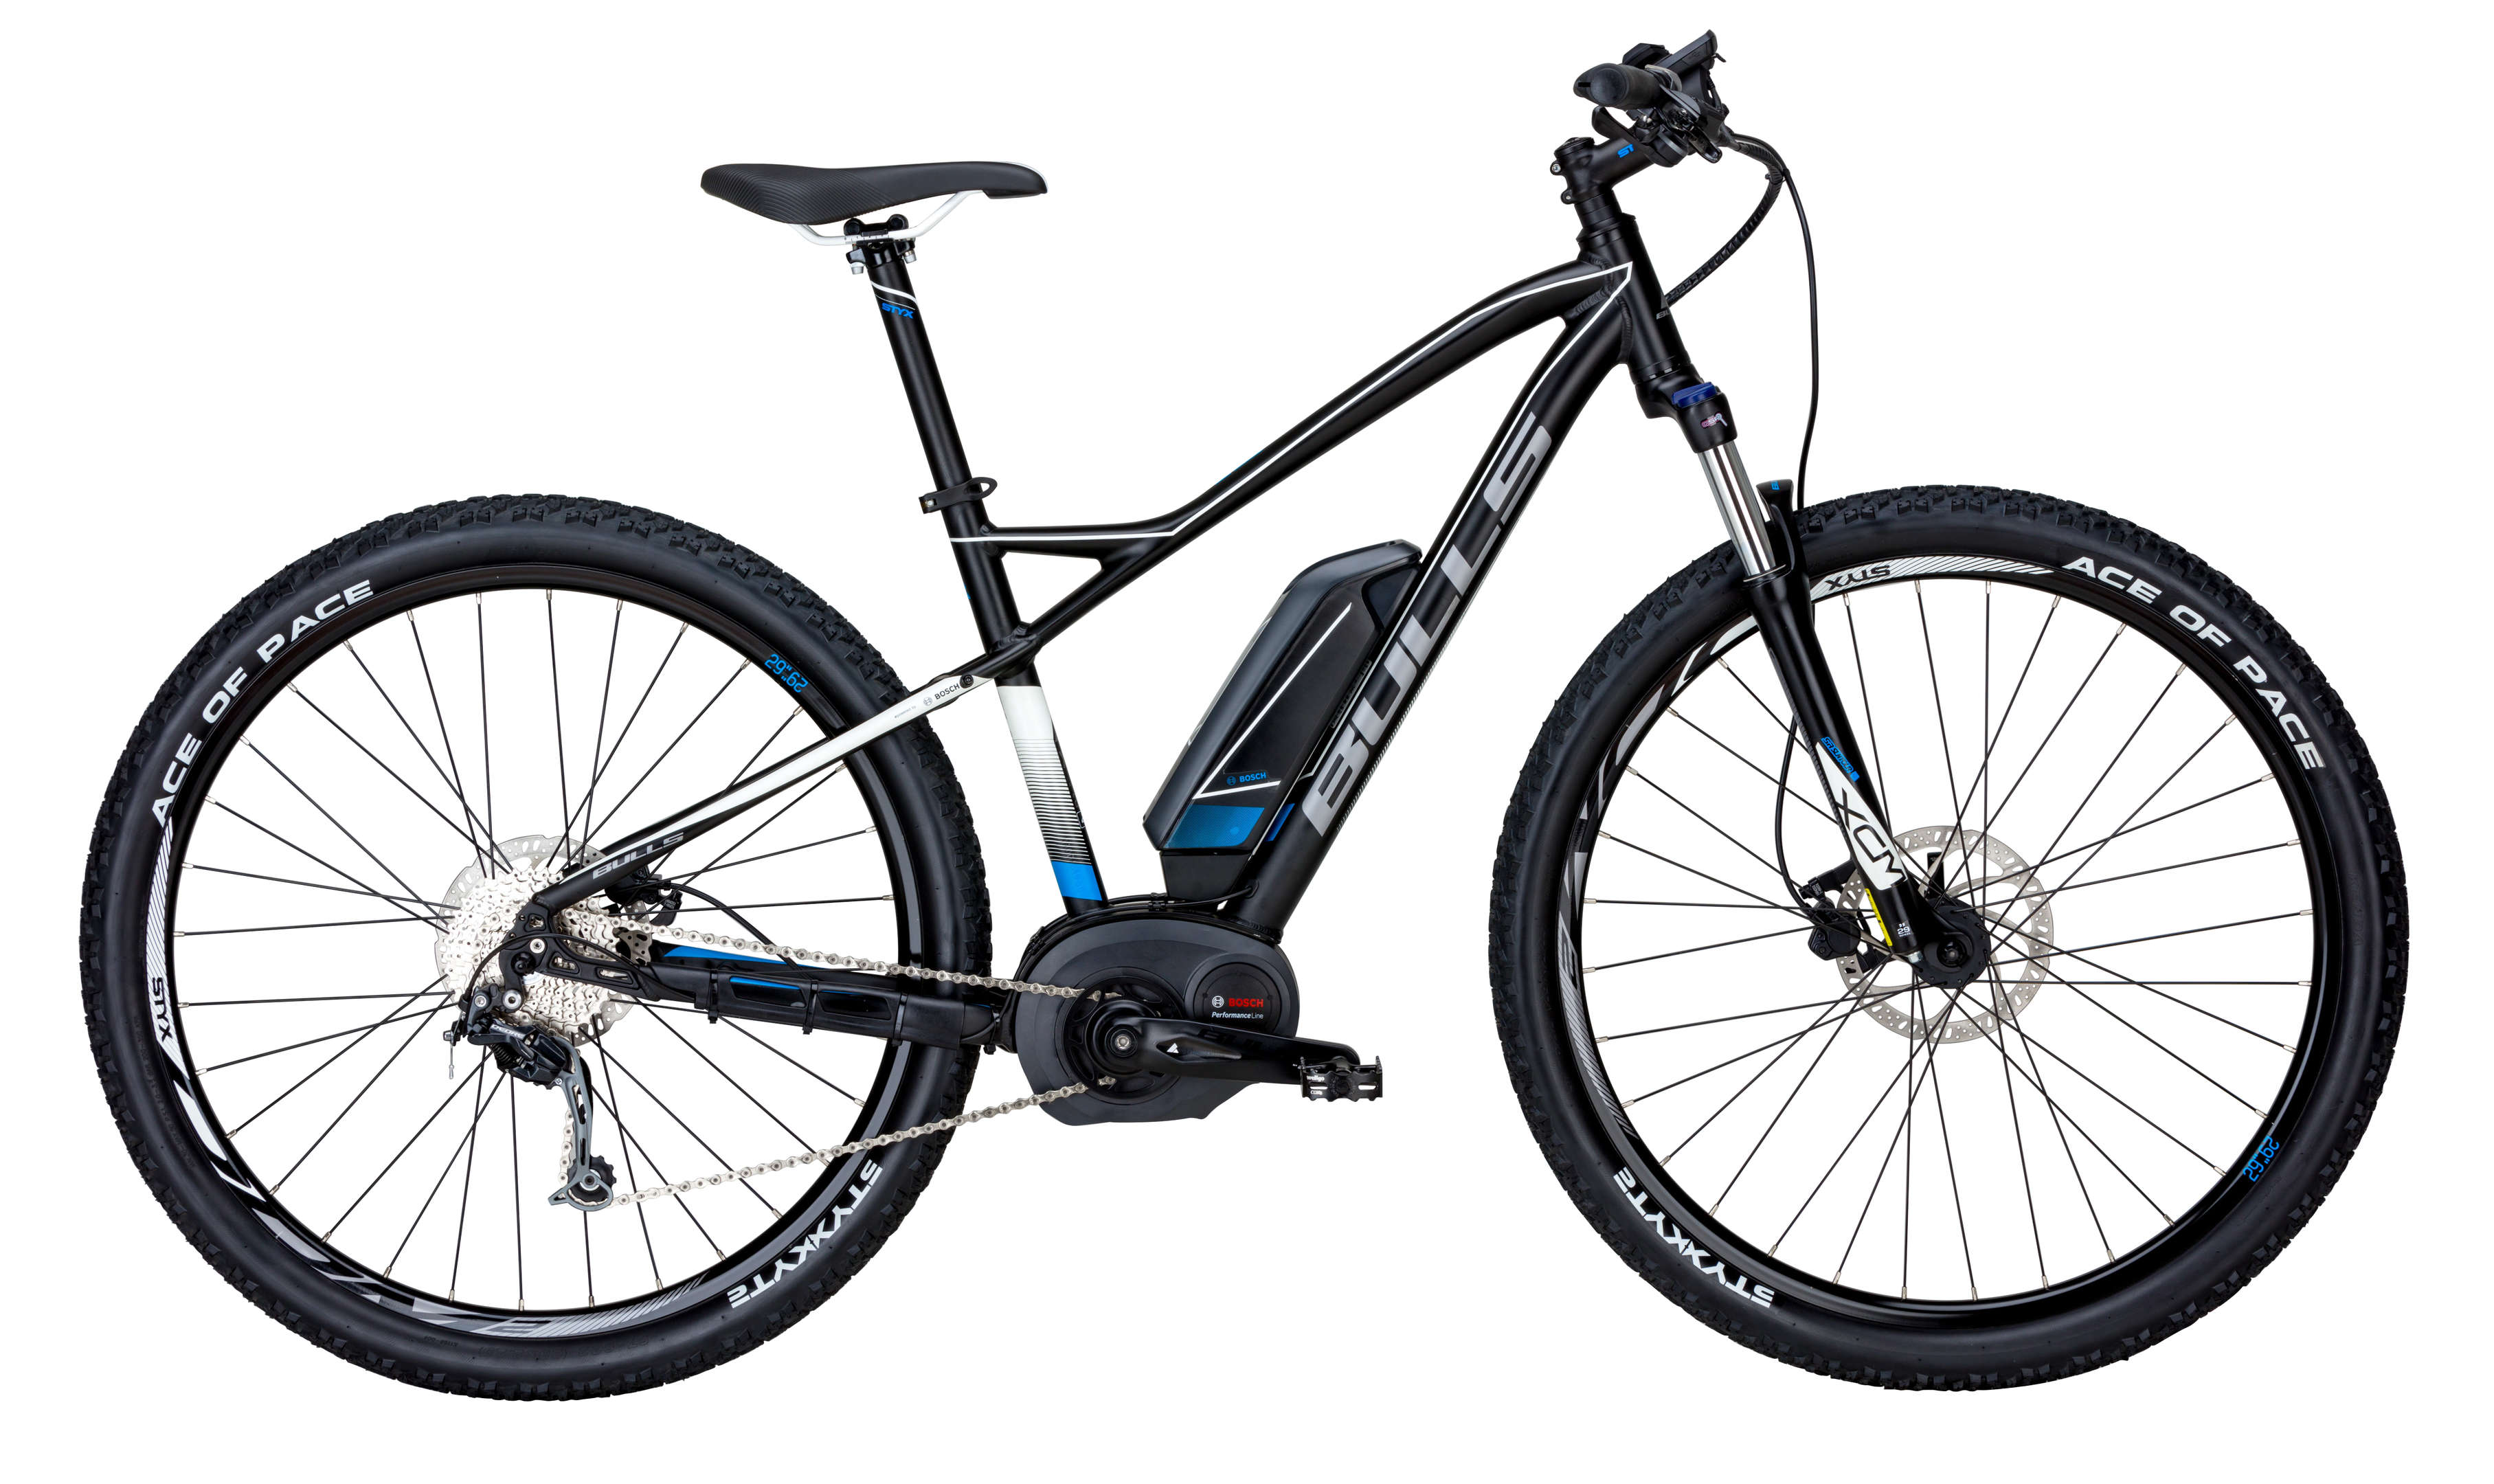 BULLS E-Bike TWENTY9 E1|BULLS E-Bike Twenty9 E1